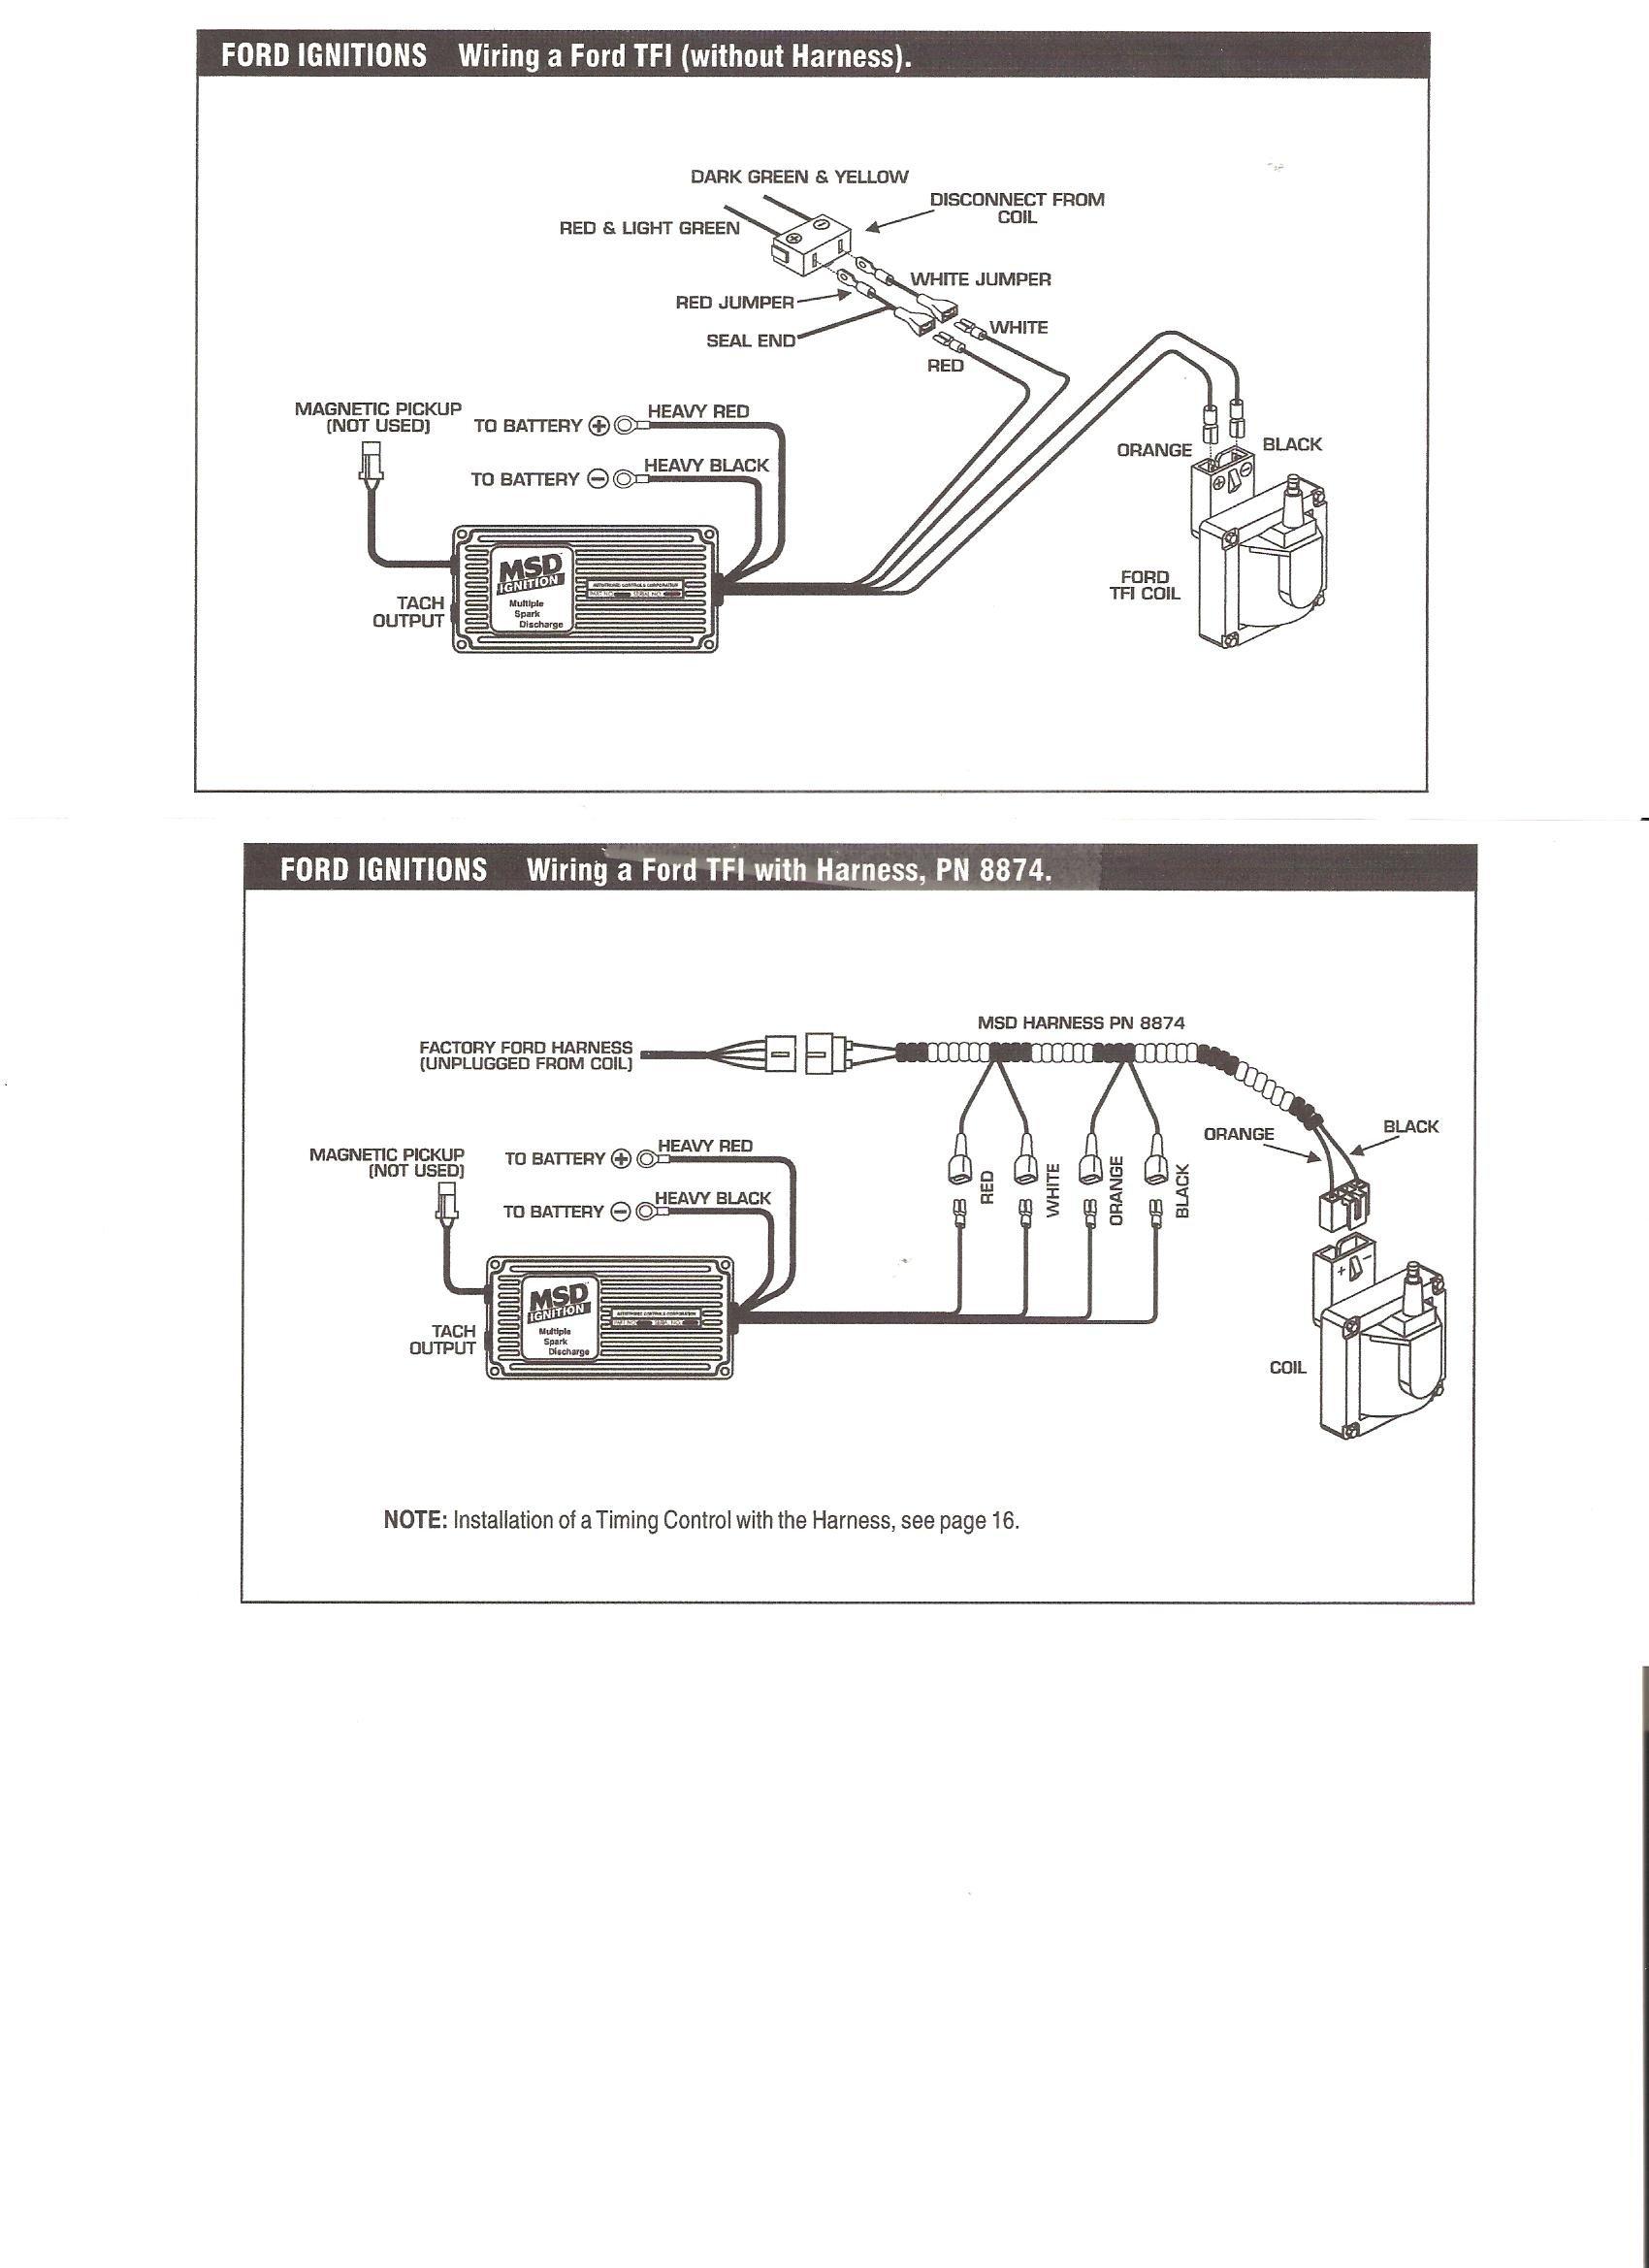 DIAGRAM] Edelbrock Msd 6al Wiring Diagram FULL Version HD Quality Wiring  Diagram - STRUCTUREDCOMPLIANCE.SHOESNEWSFRANCE.FRShoesnewsfrance.fr